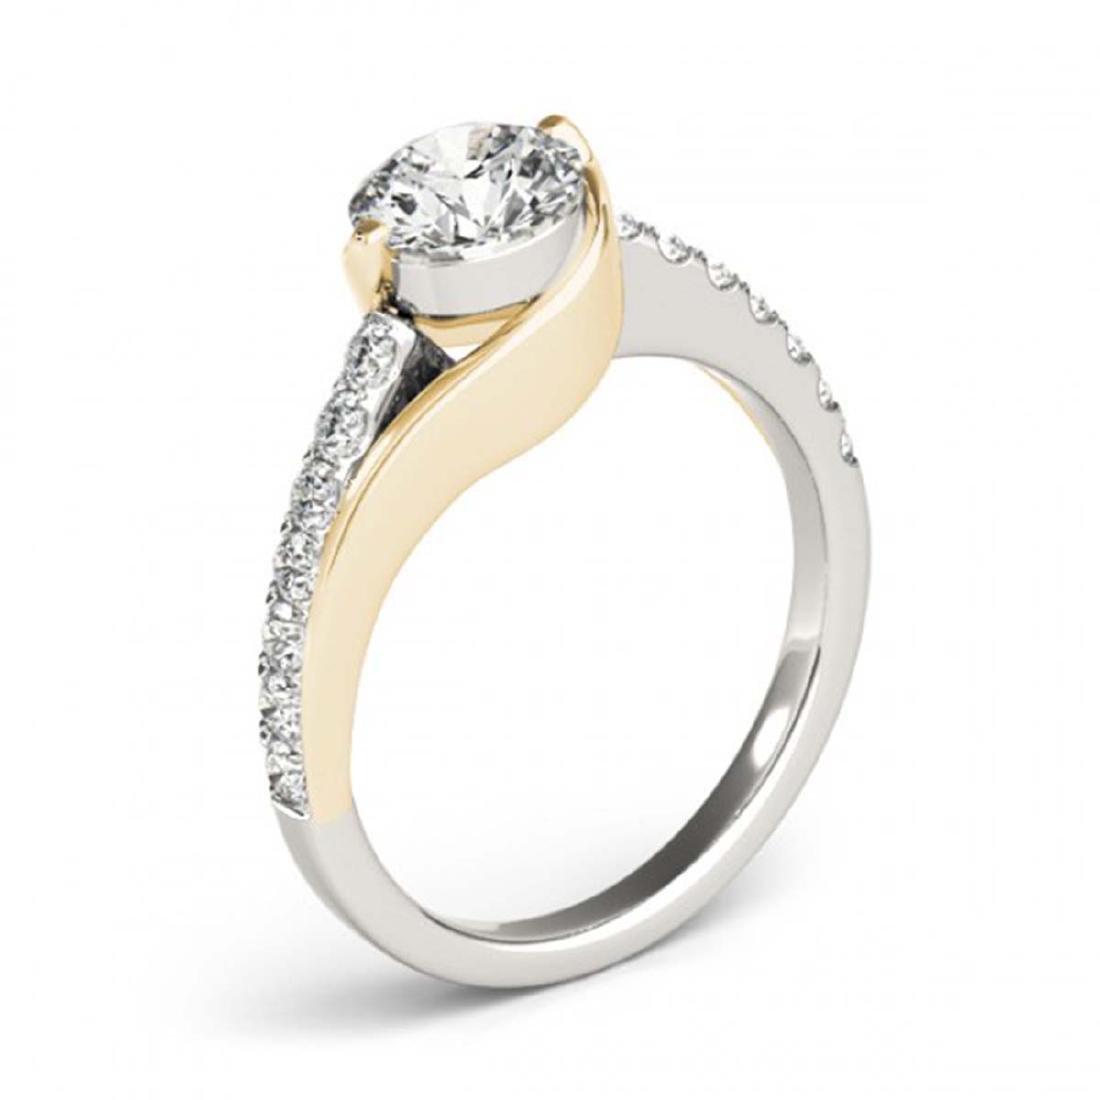 1.25 ctw VS/SI Diamond Solitaire Ring 14K White & - 3